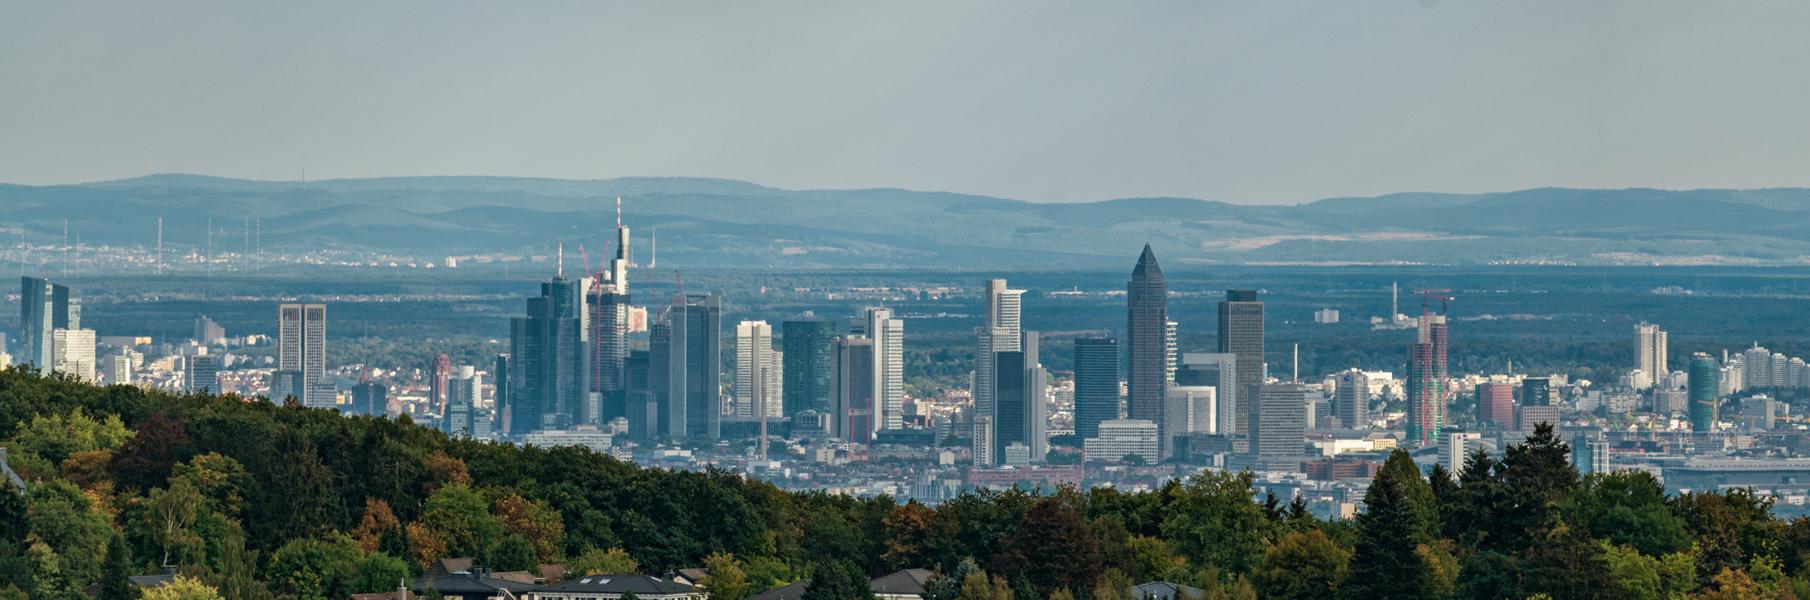 Bild: https://abload.de/img/skyline_koenigsteink5epp.jpg